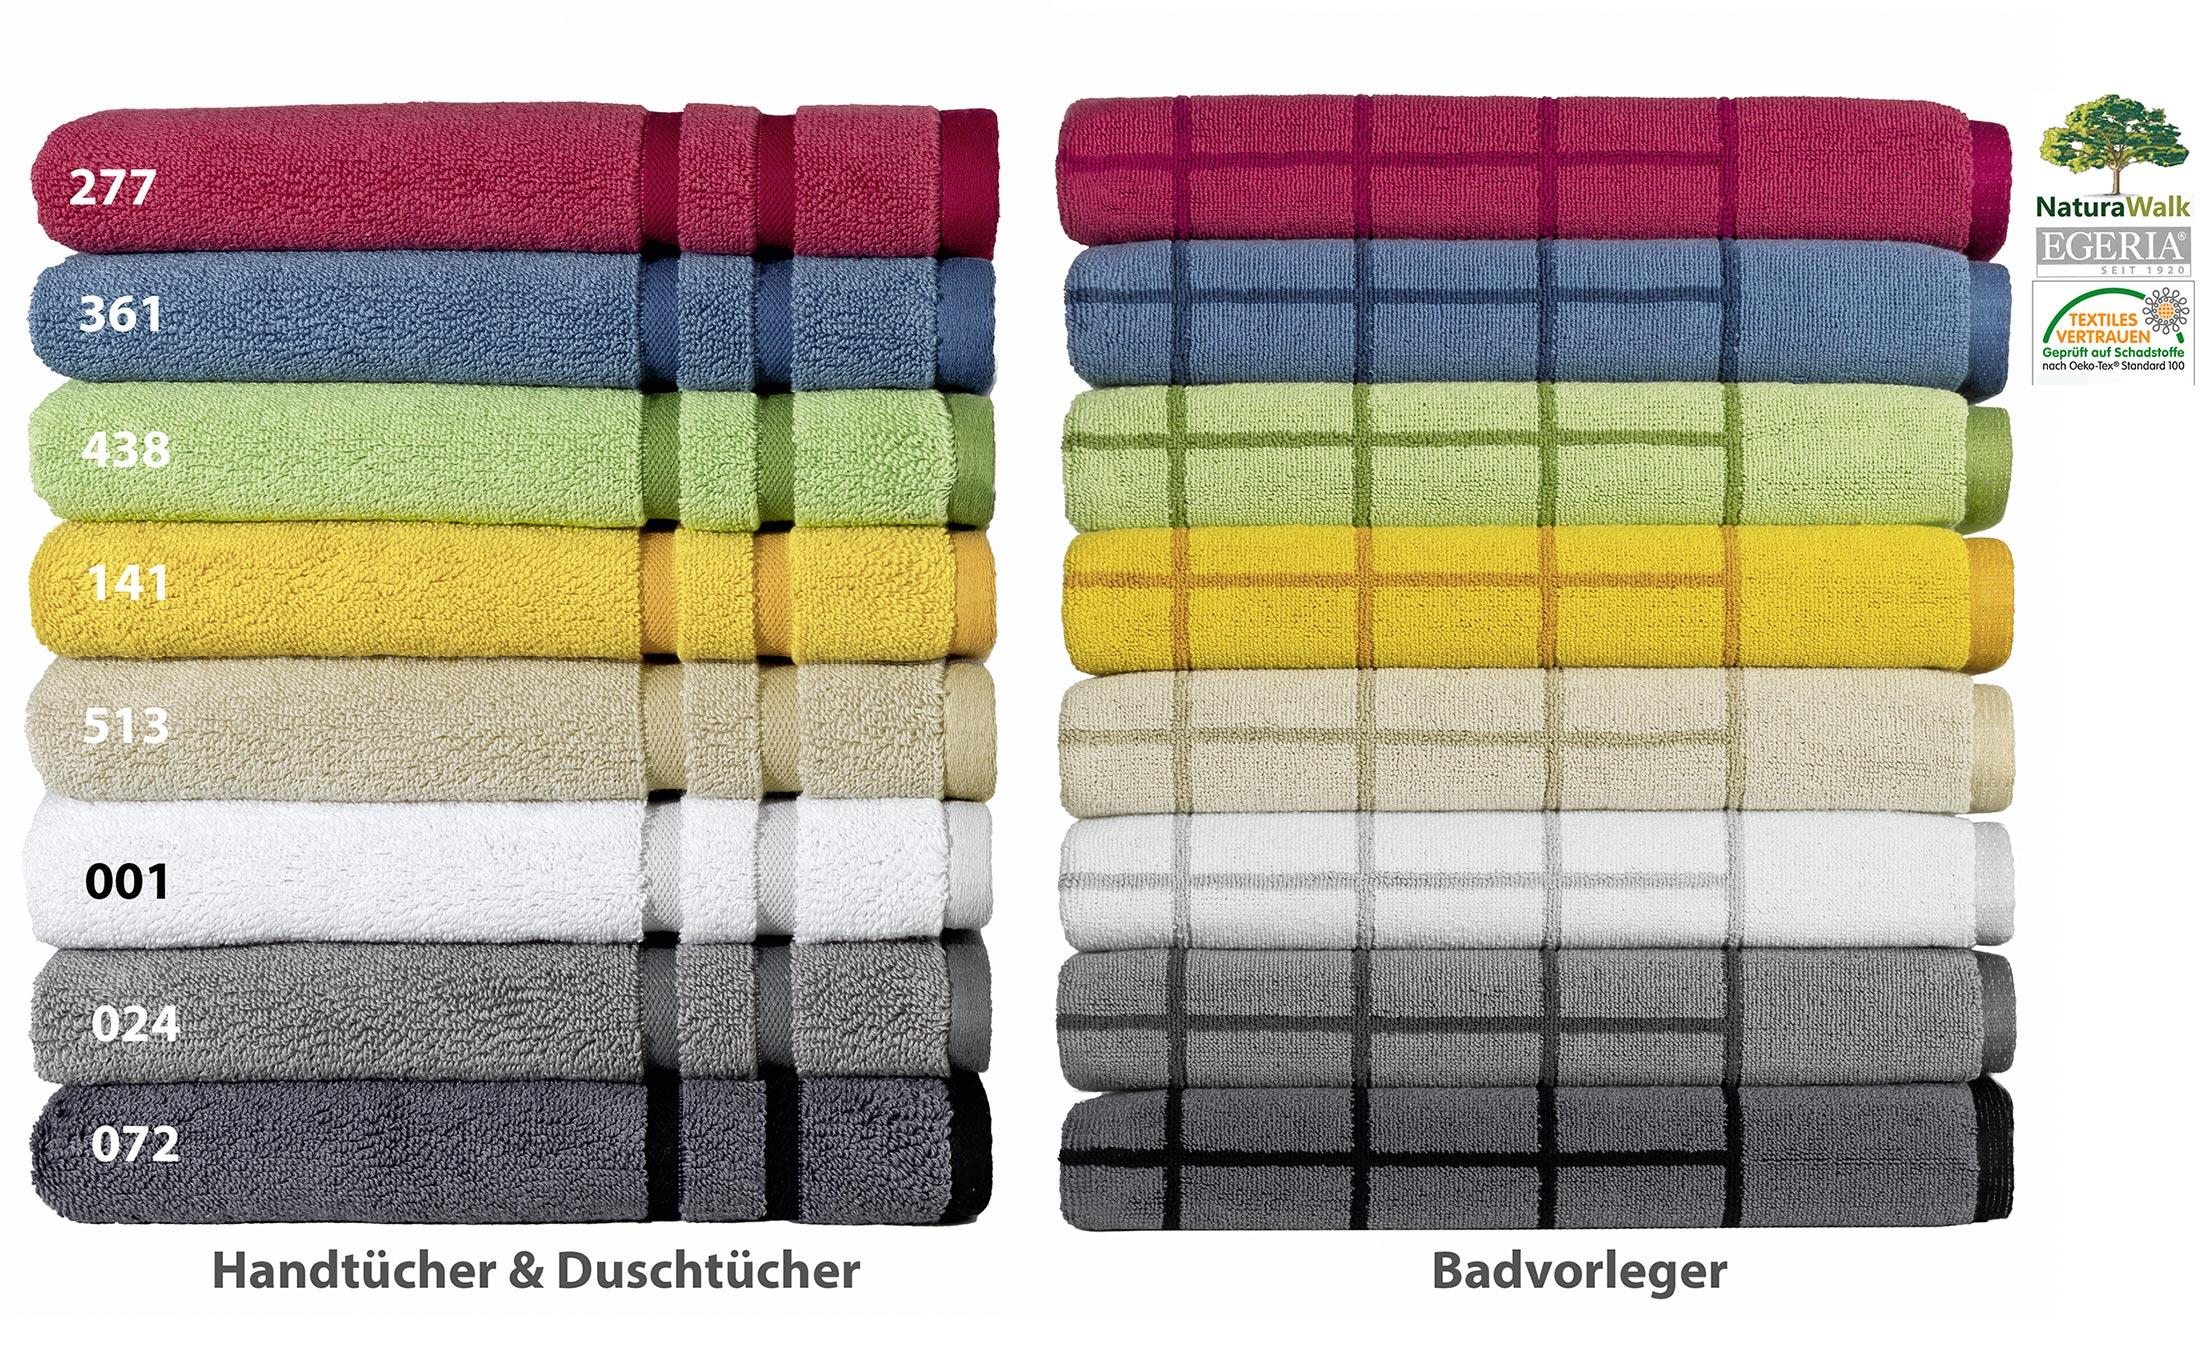 badematten & badvorleger 50x70 cm online kaufen | naturawalk.de, Hause ideen